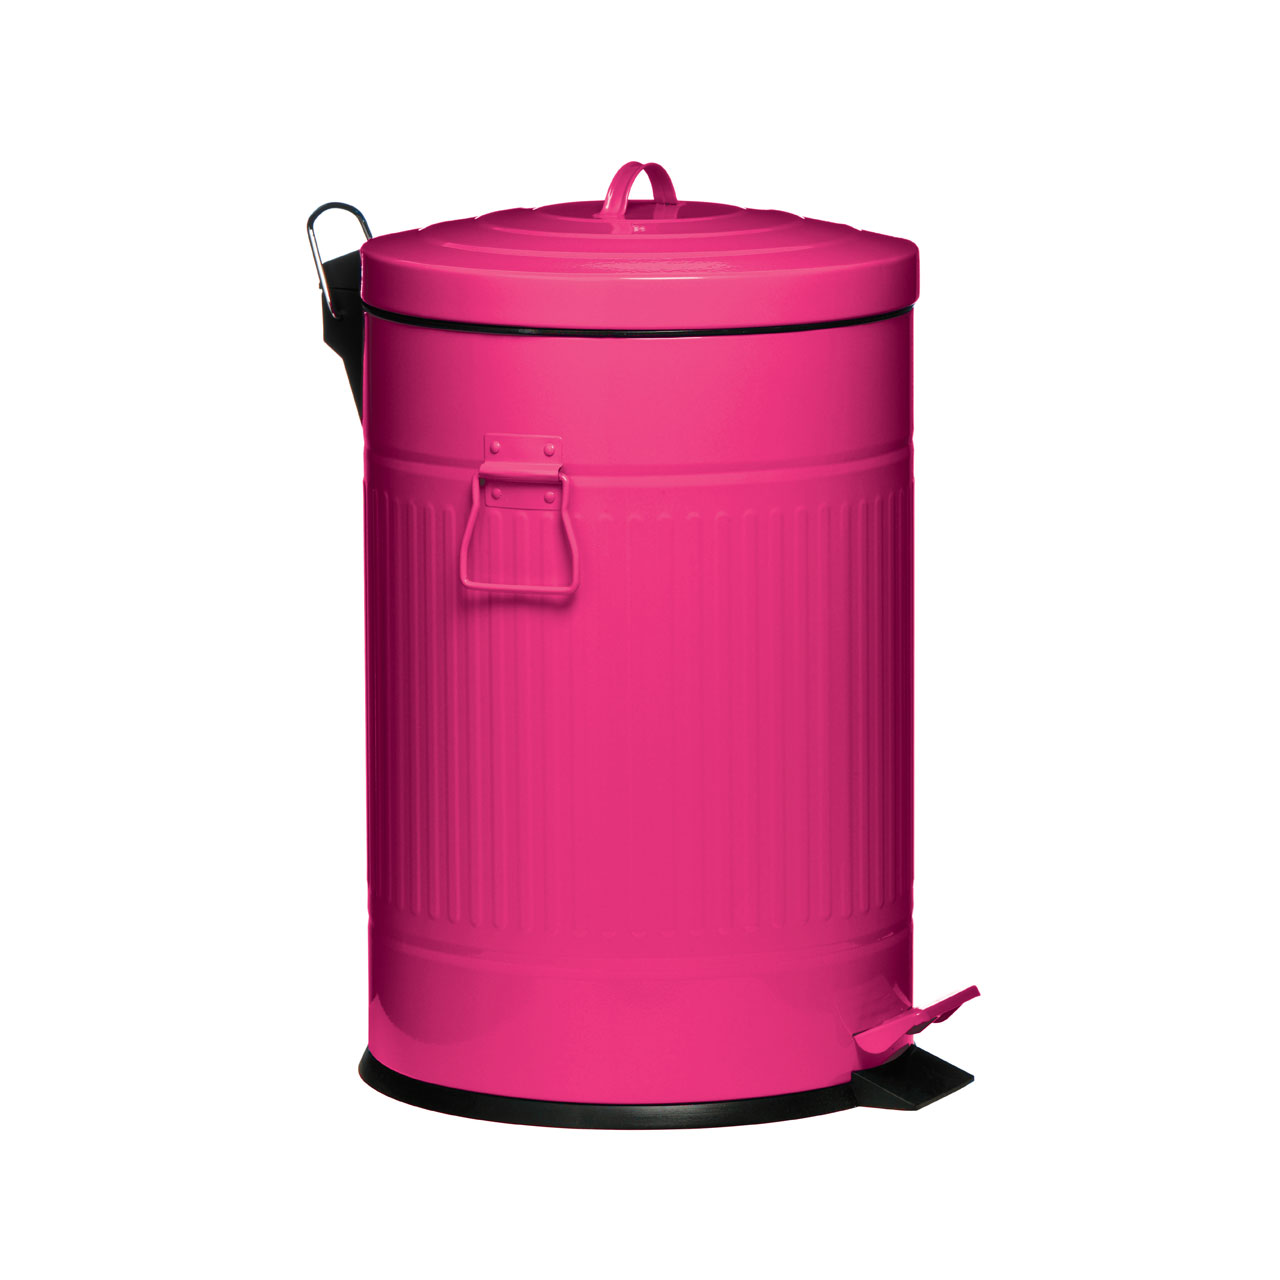 20 litre round kitchen pedal dust bin trash can galvanised steel plastic inner ebay. Black Bedroom Furniture Sets. Home Design Ideas